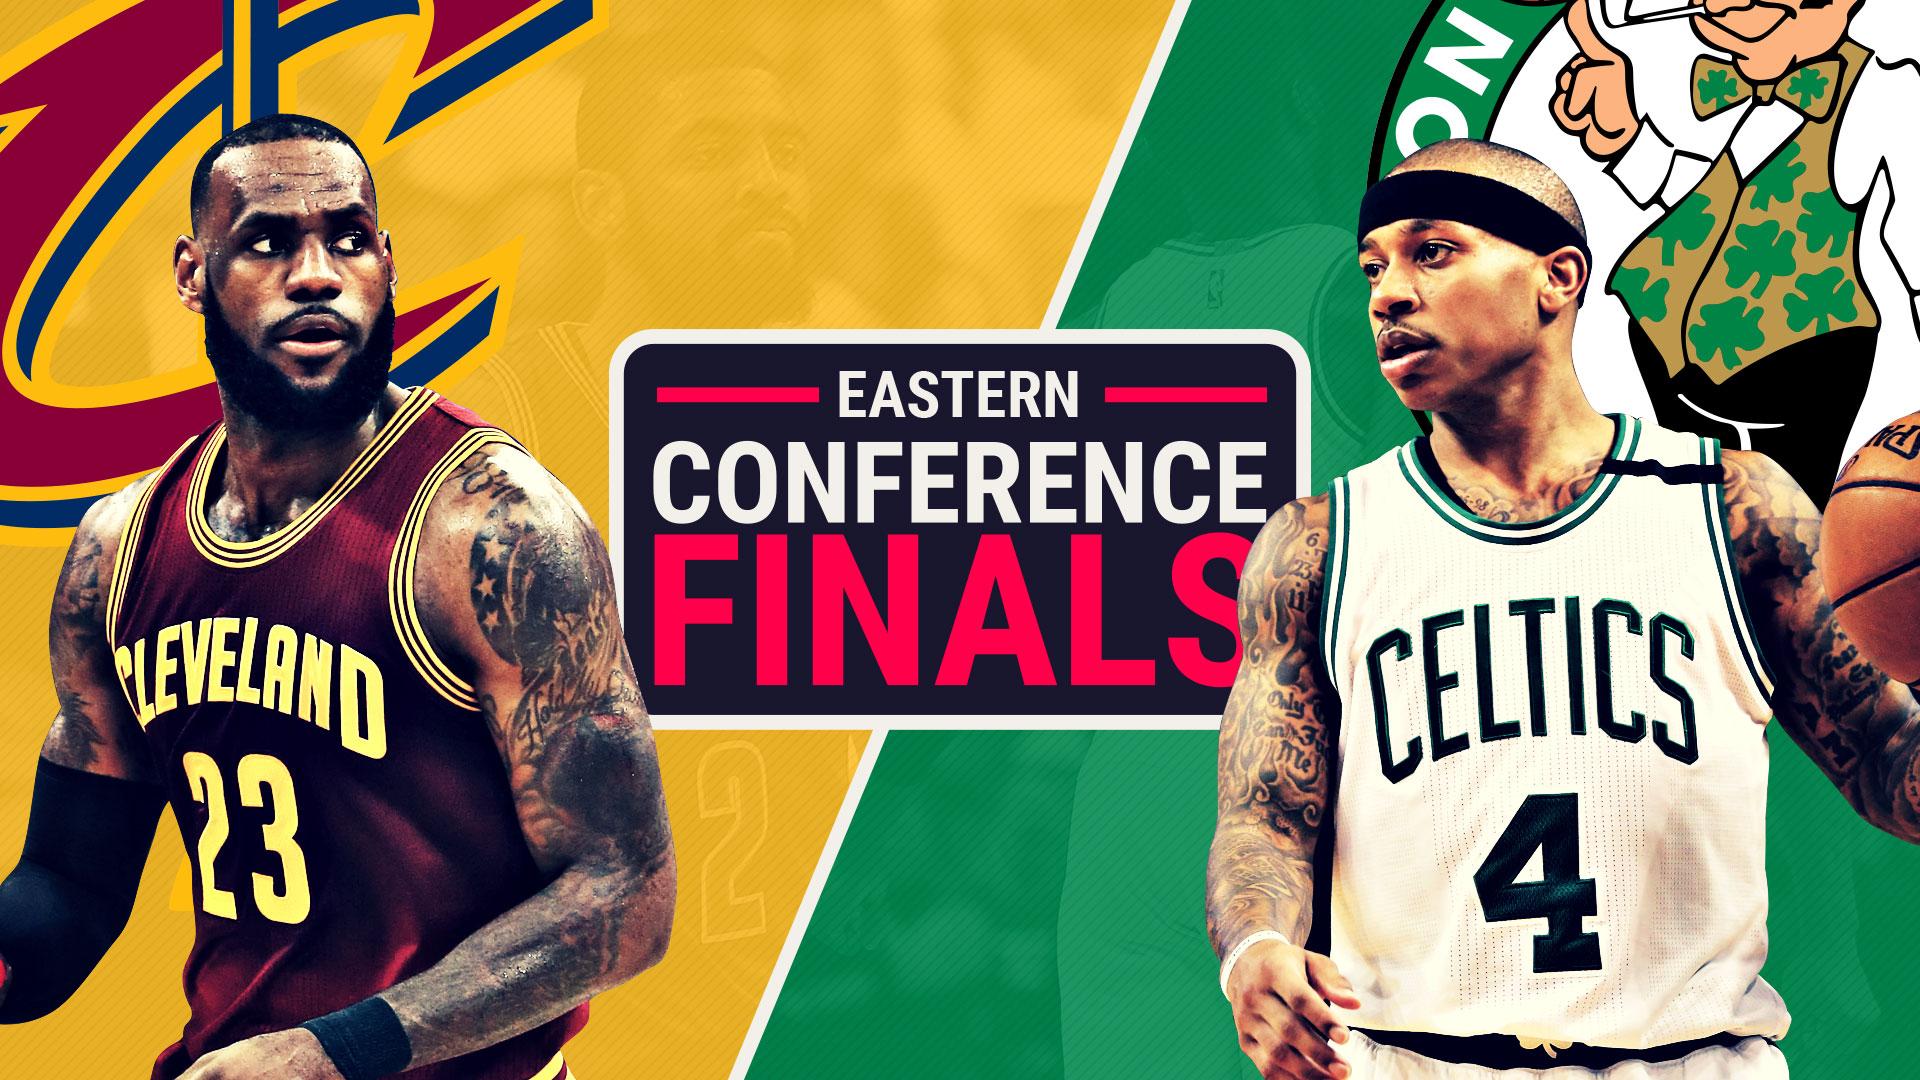 NBA playoffs 2017: LeBron, Cavs crush Celtics on road, take command of East finals | NBA ...